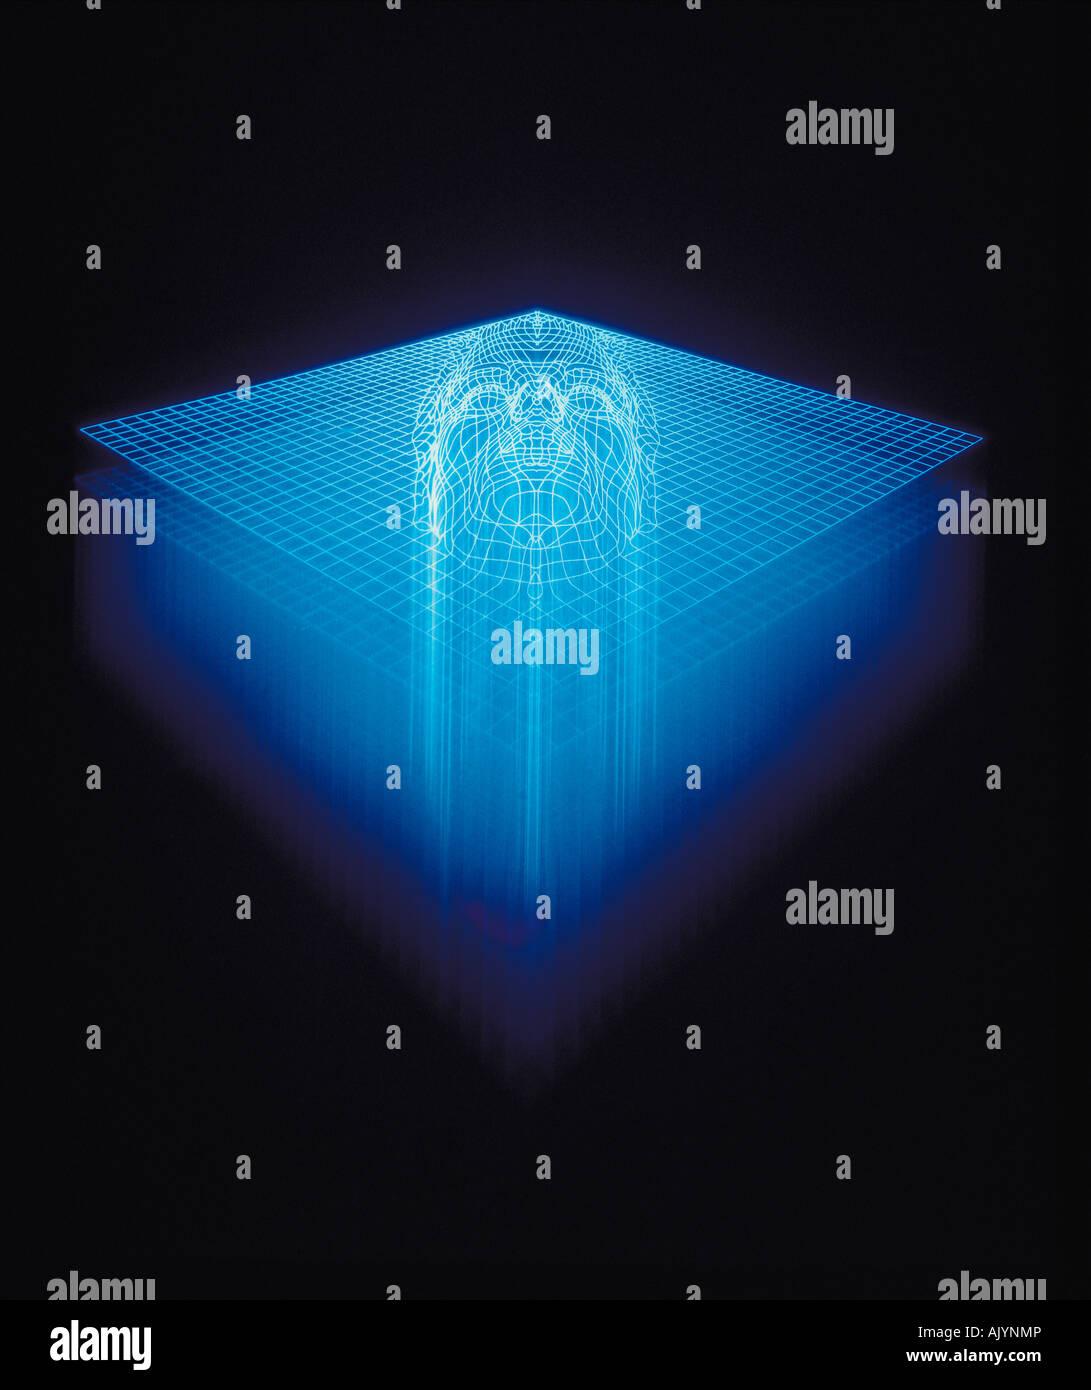 Artwork, Illustration, Concept, Face in blue grid pattern, - Stock Image